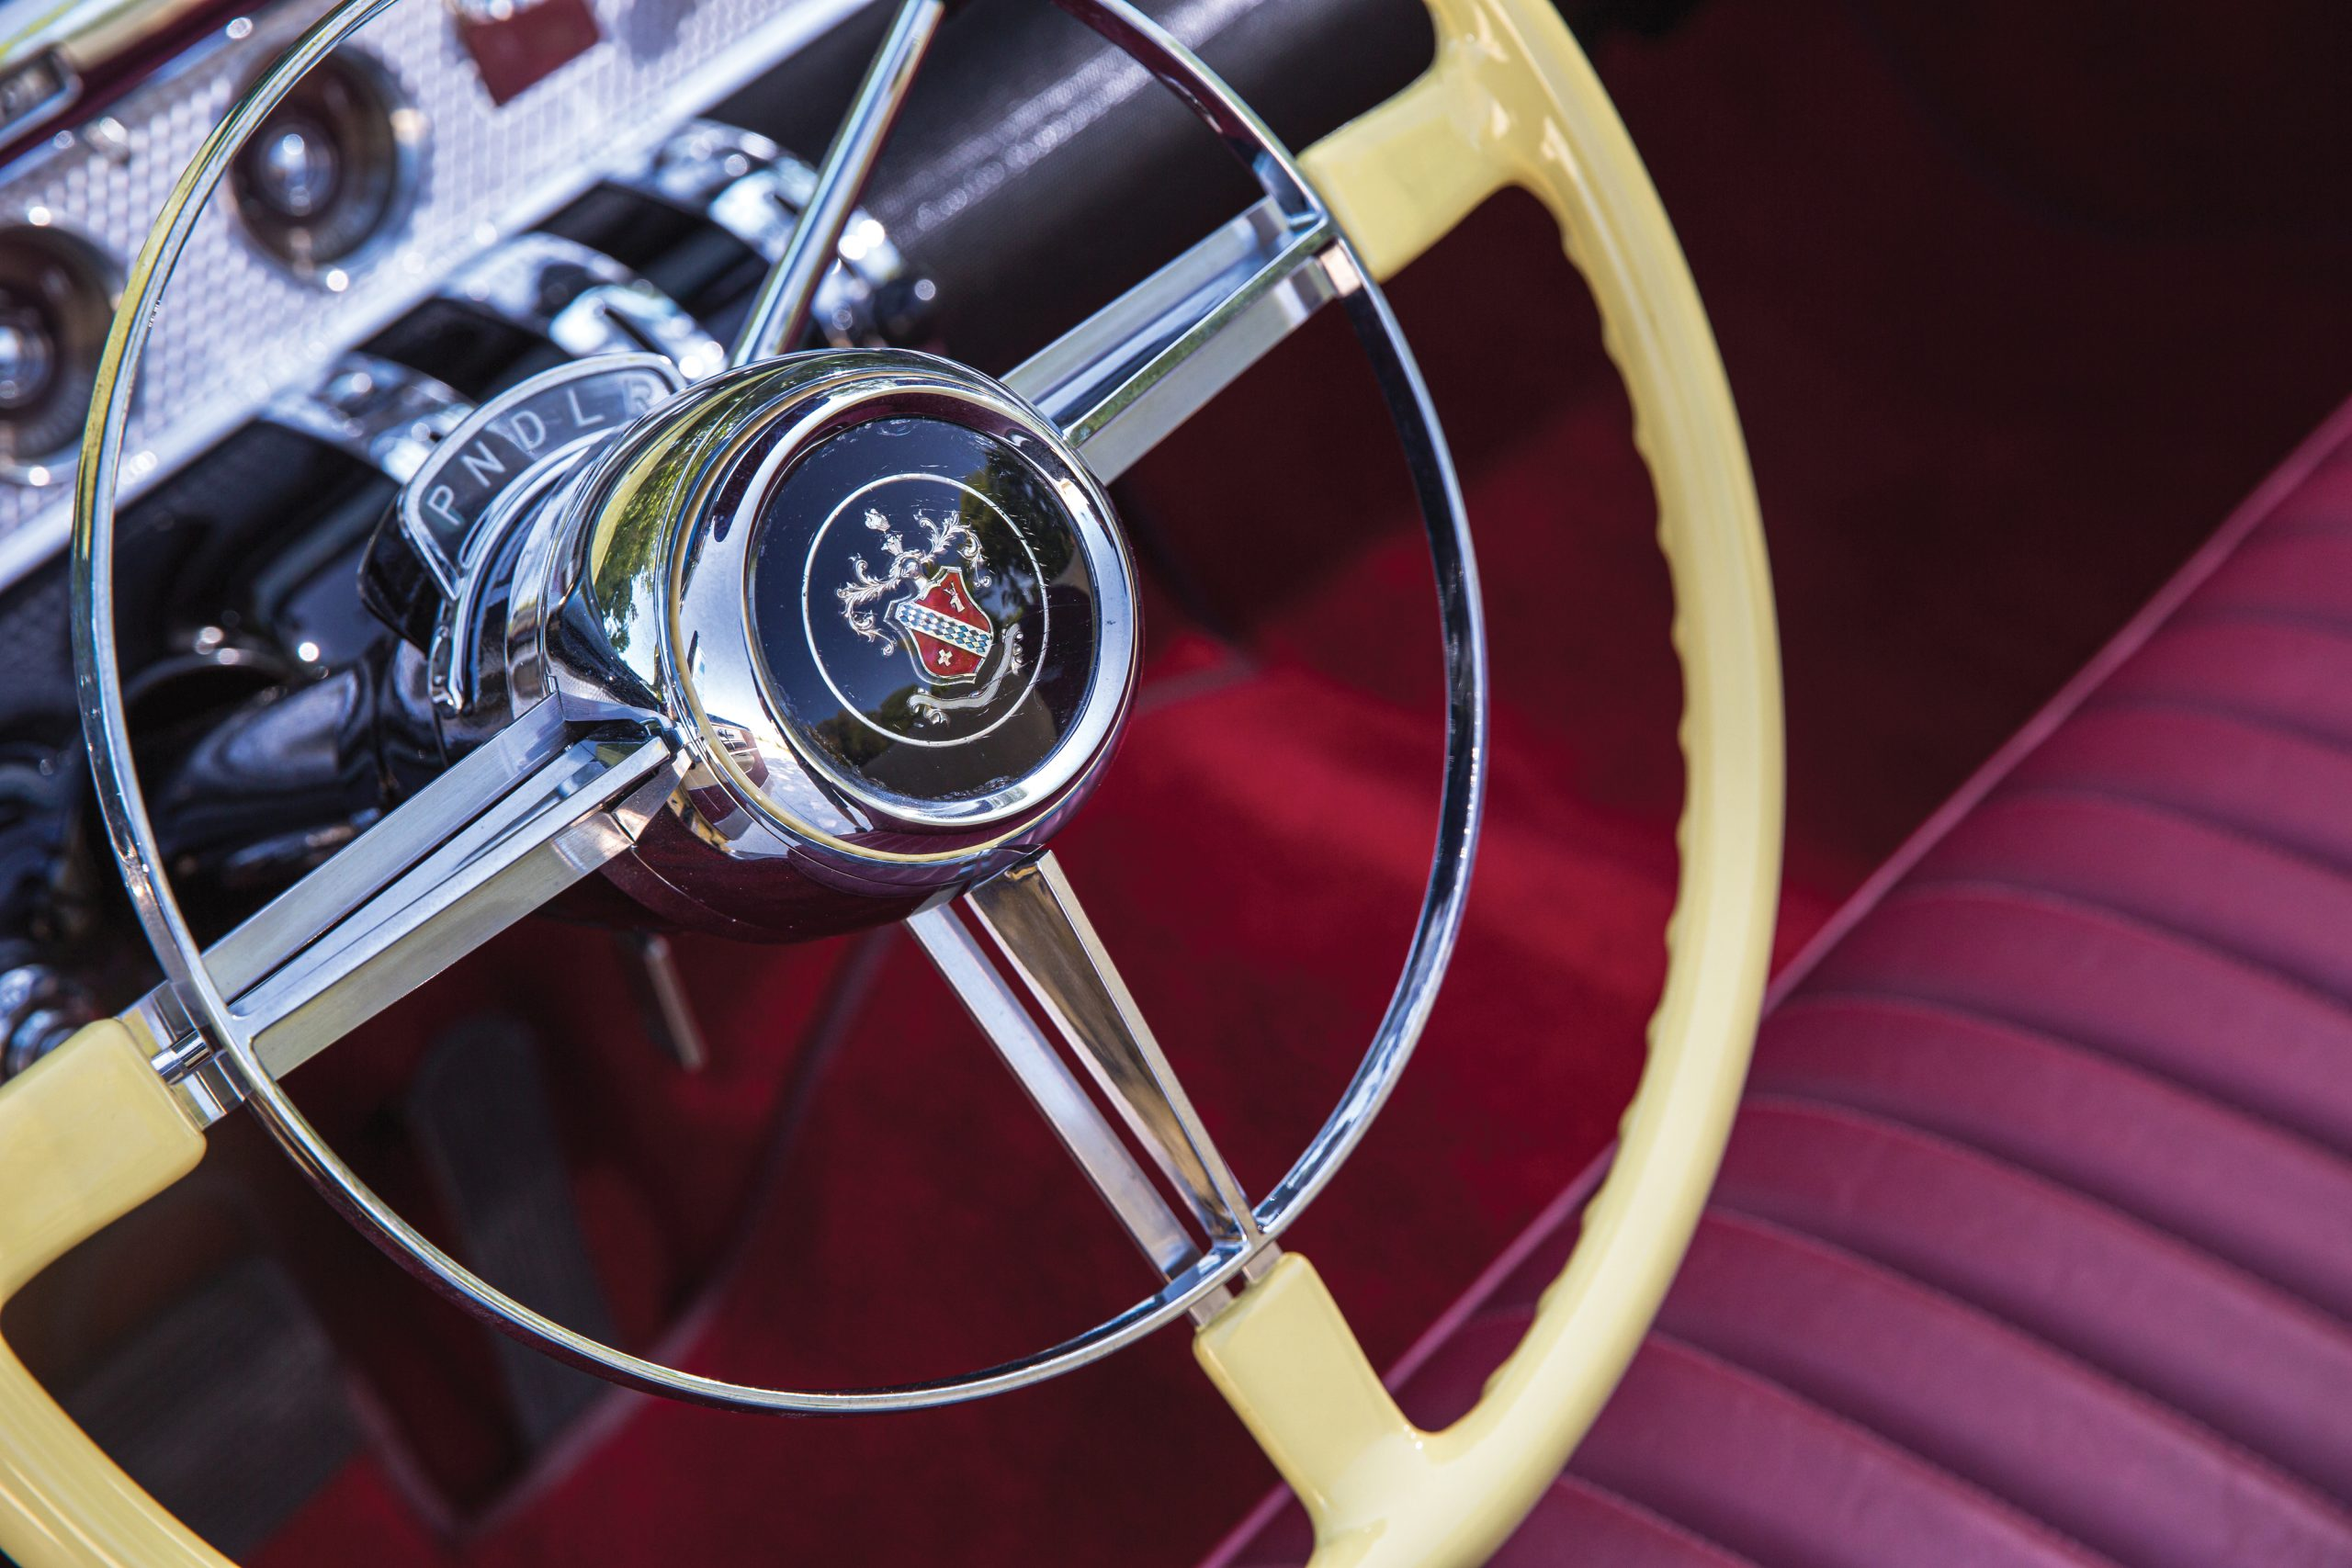 1954 Buick Roadmaster Convertible interior